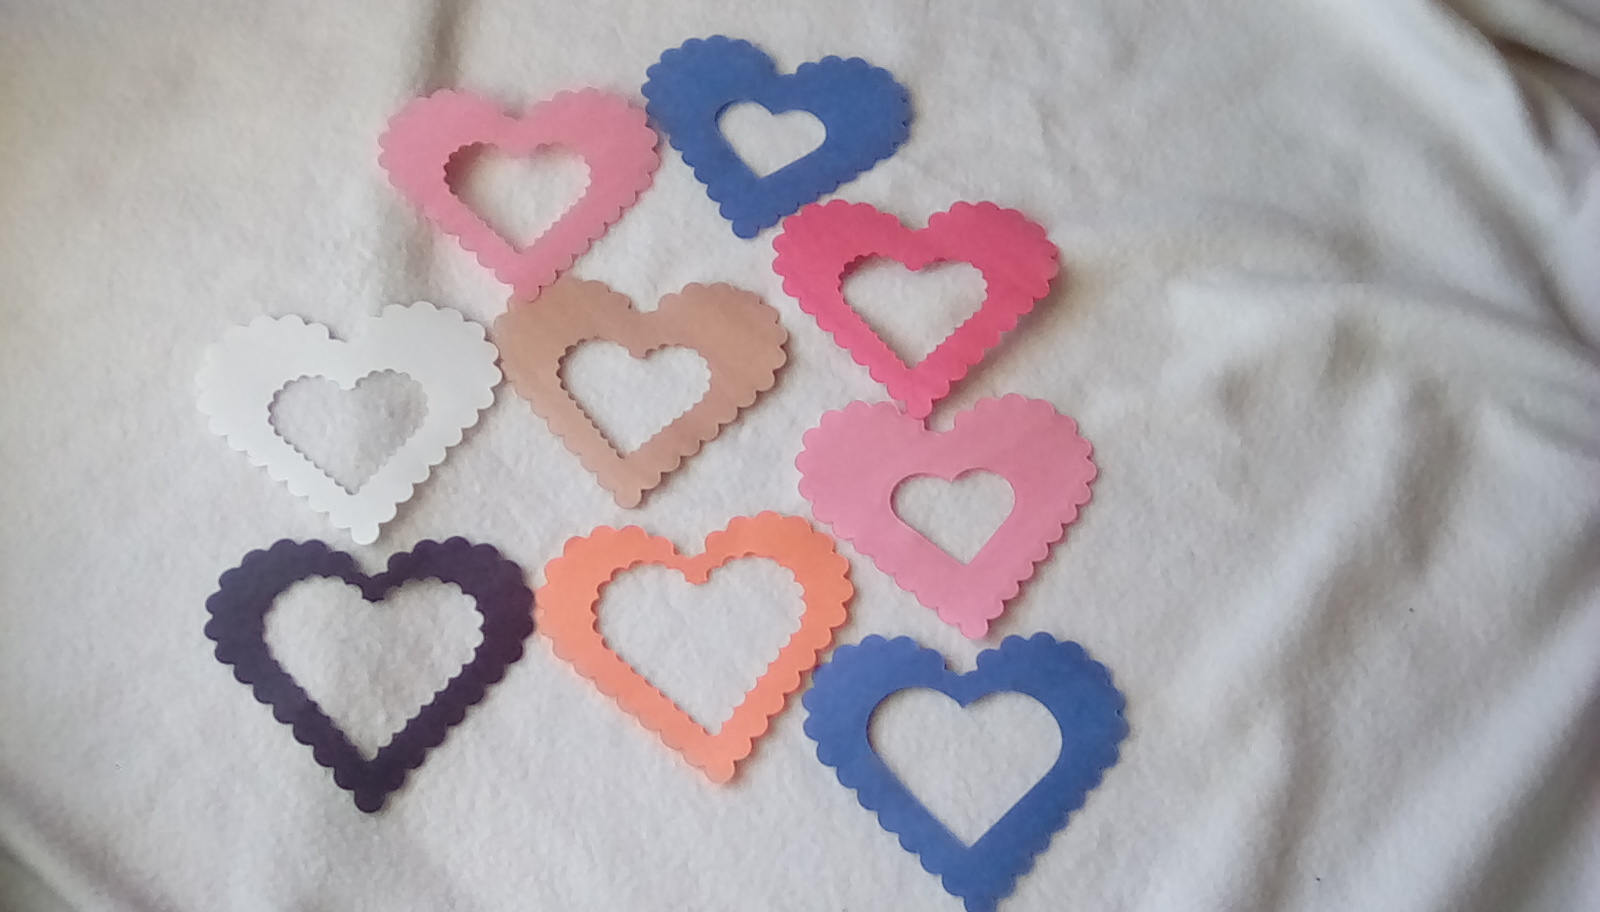 750 Pieces Random Mix Die Cut Hearts-Valentine's Day-Construction Paper,Crafts,,